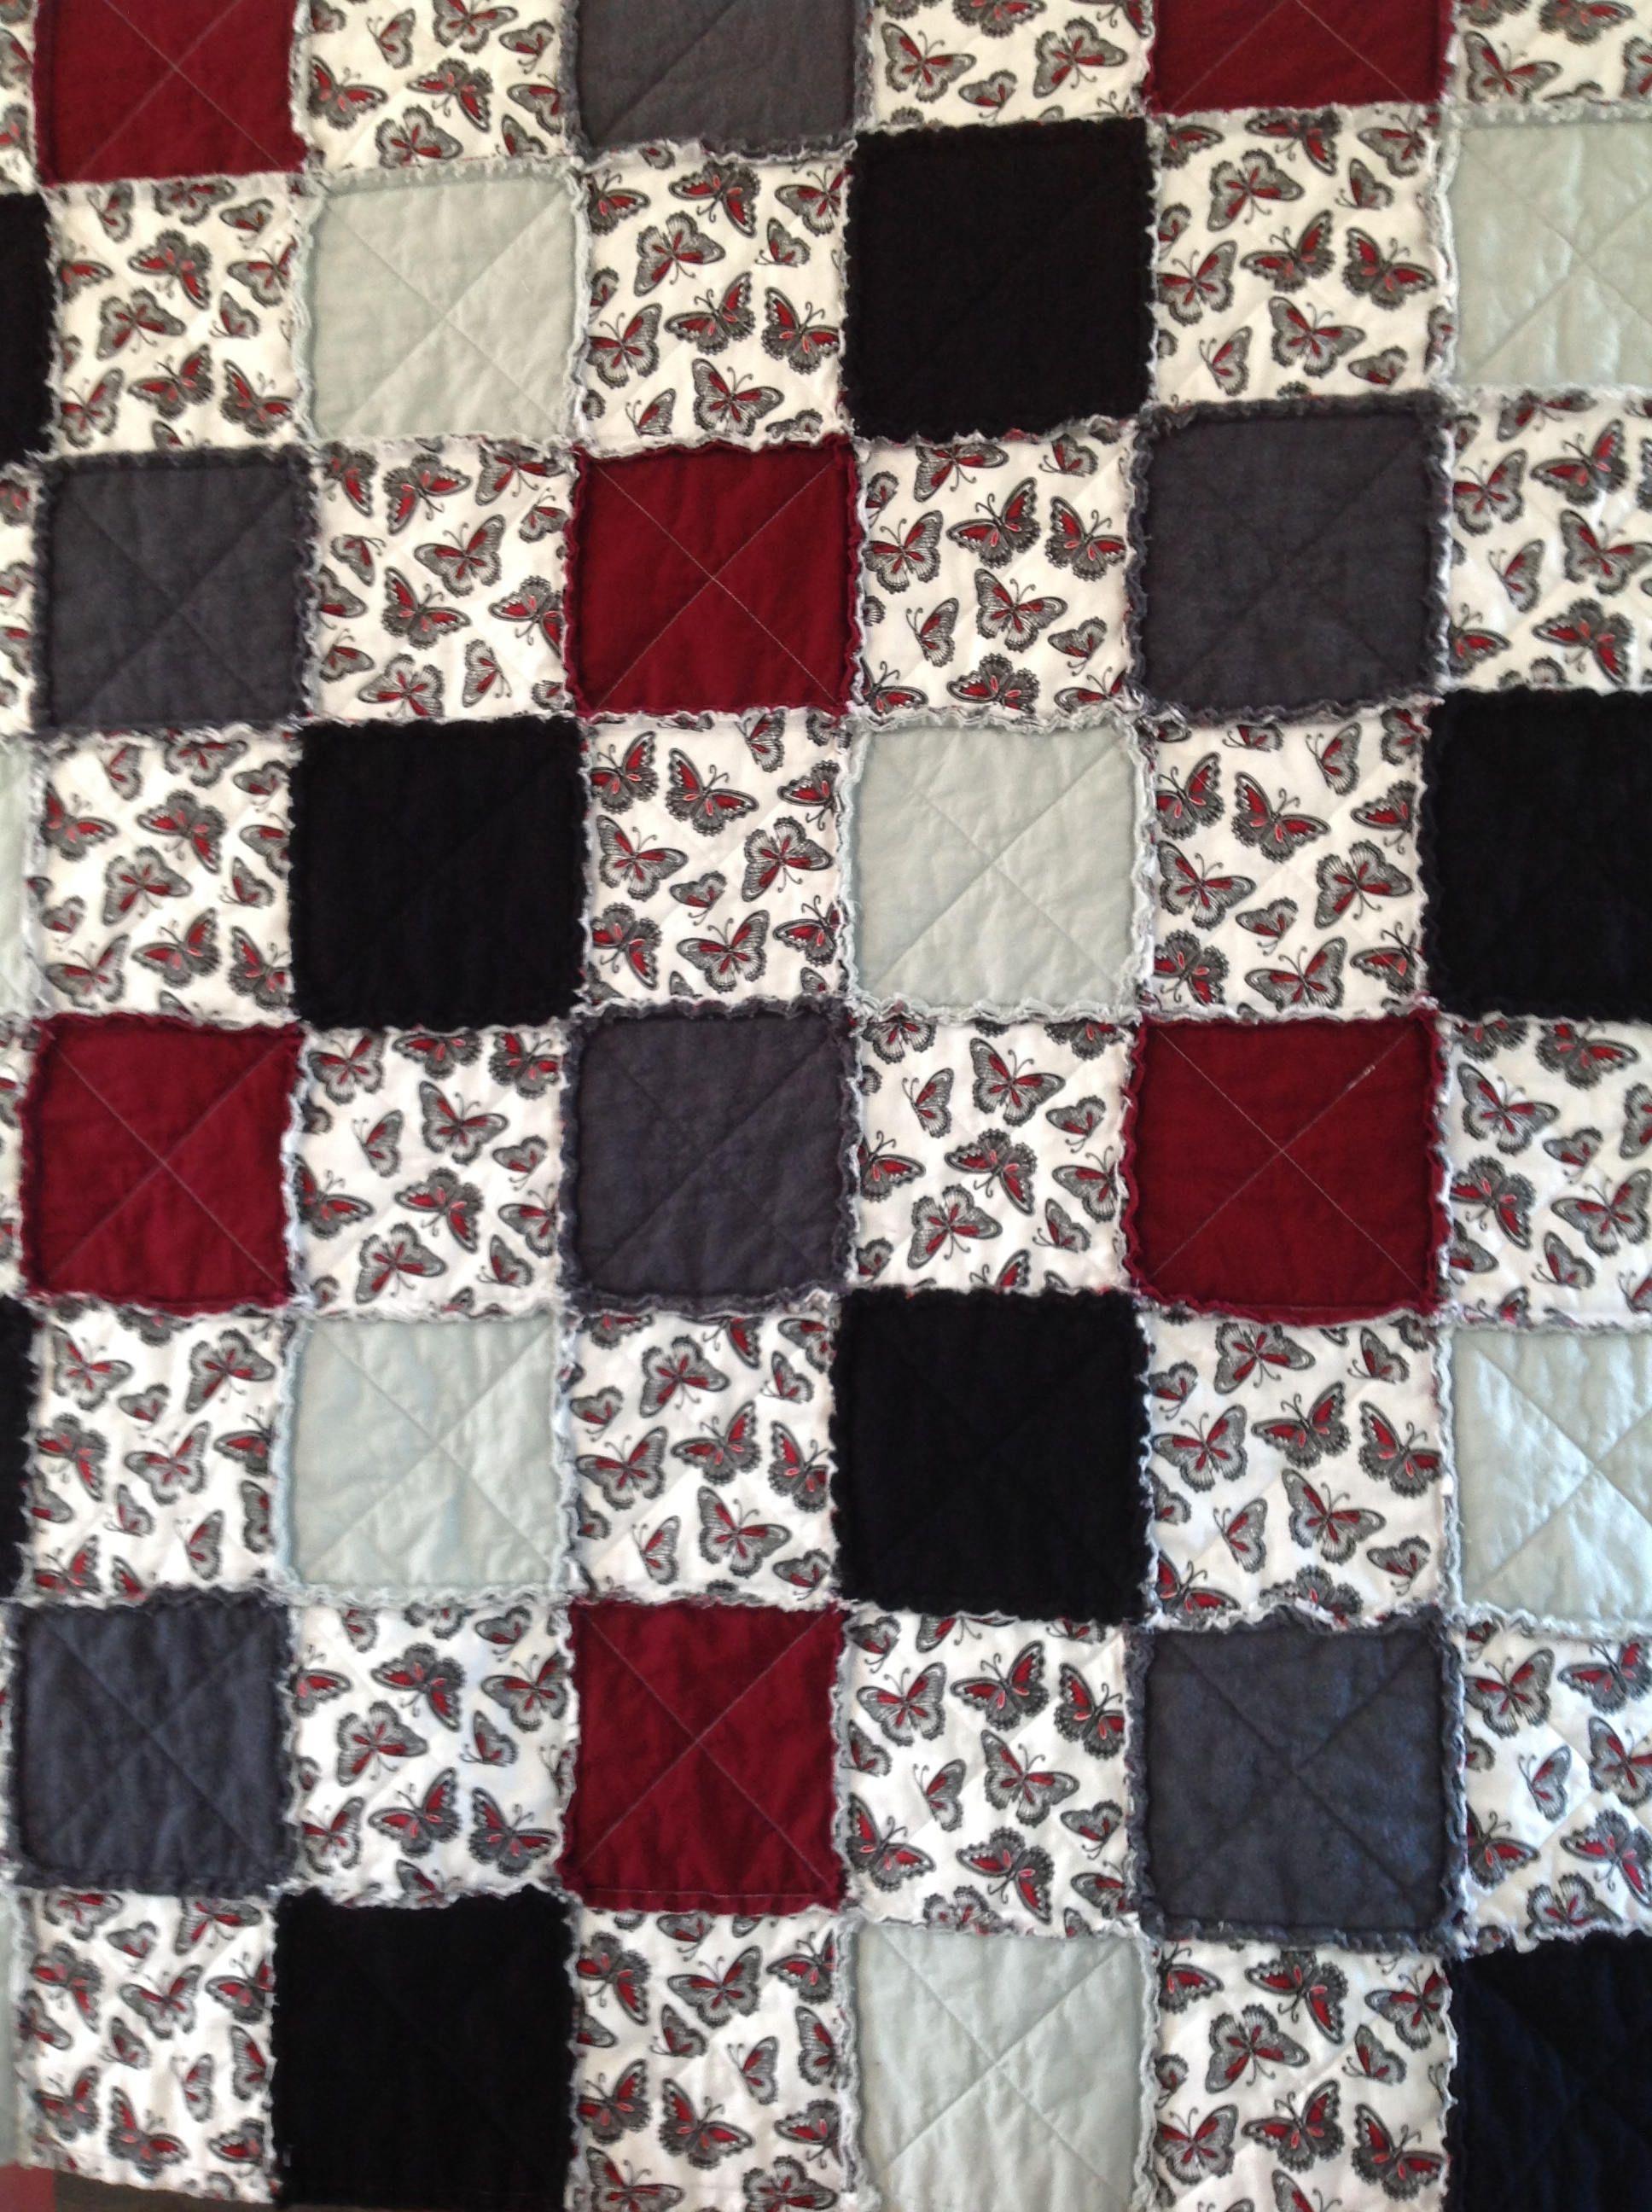 Rag Quilt, Lap Quilt, Homemade Quilt, Fall Quilt, Butterfly ... : black quilts for sale - Adamdwight.com